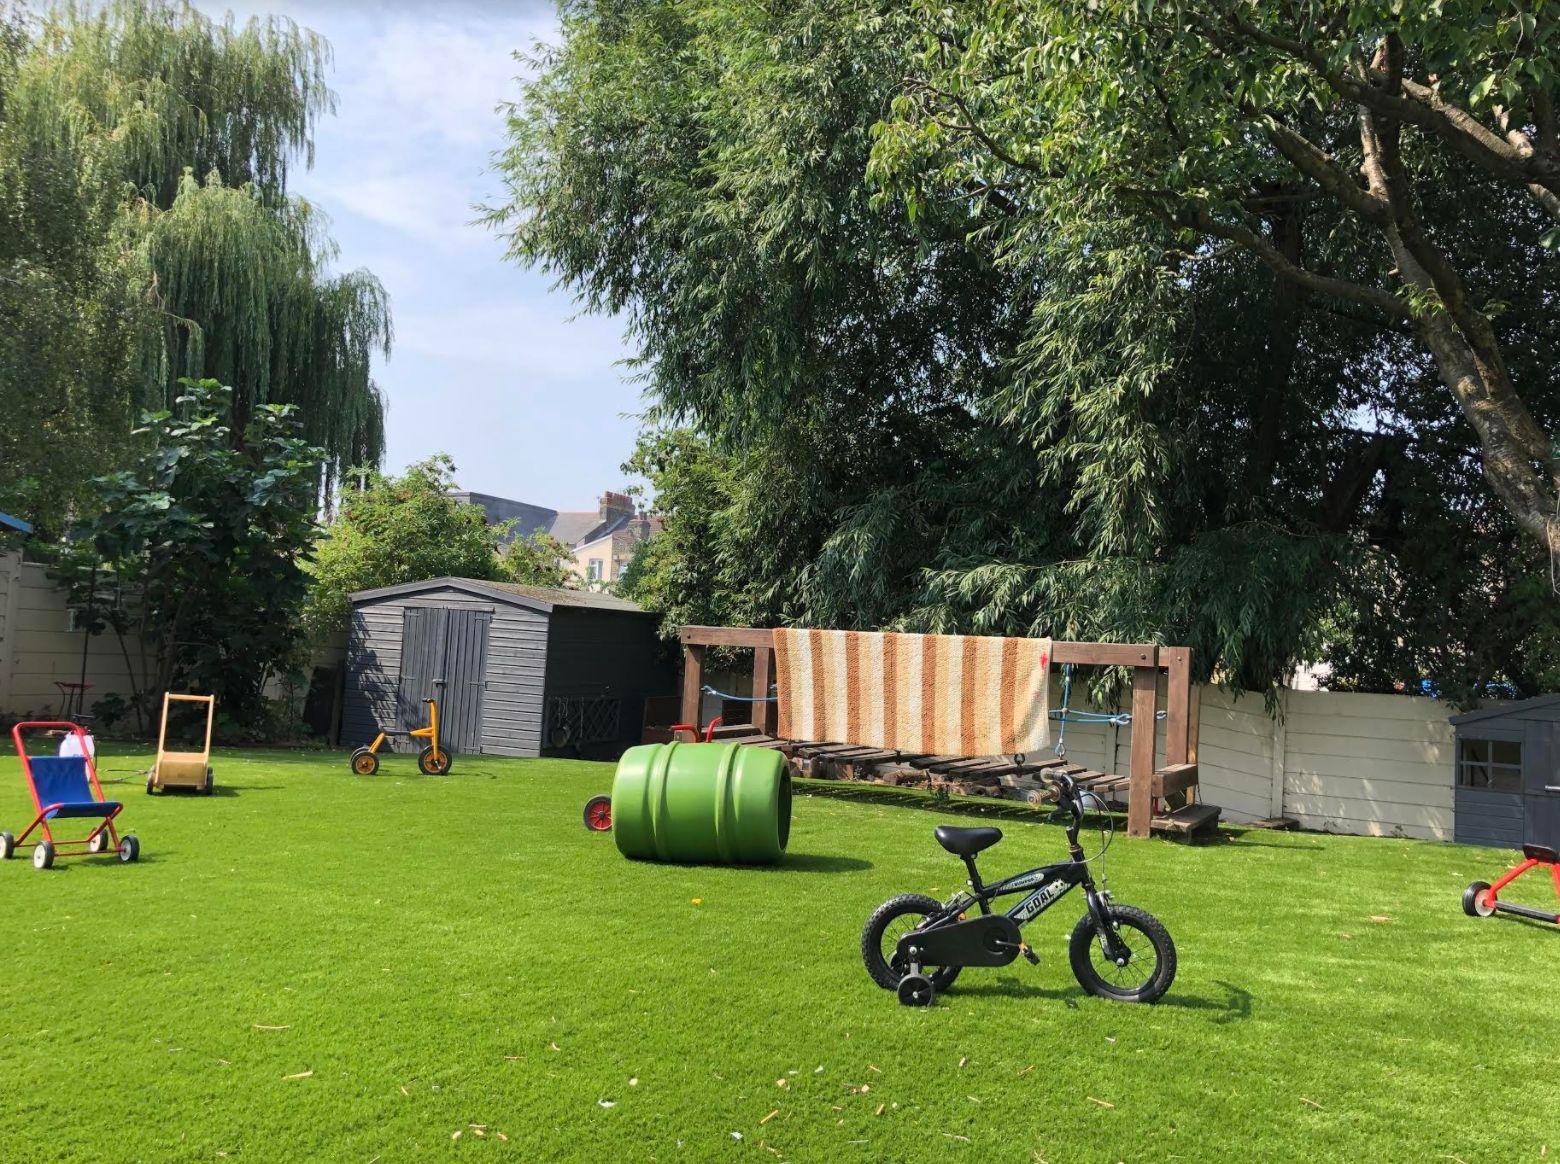 The garden area at Eastbury Nursery.